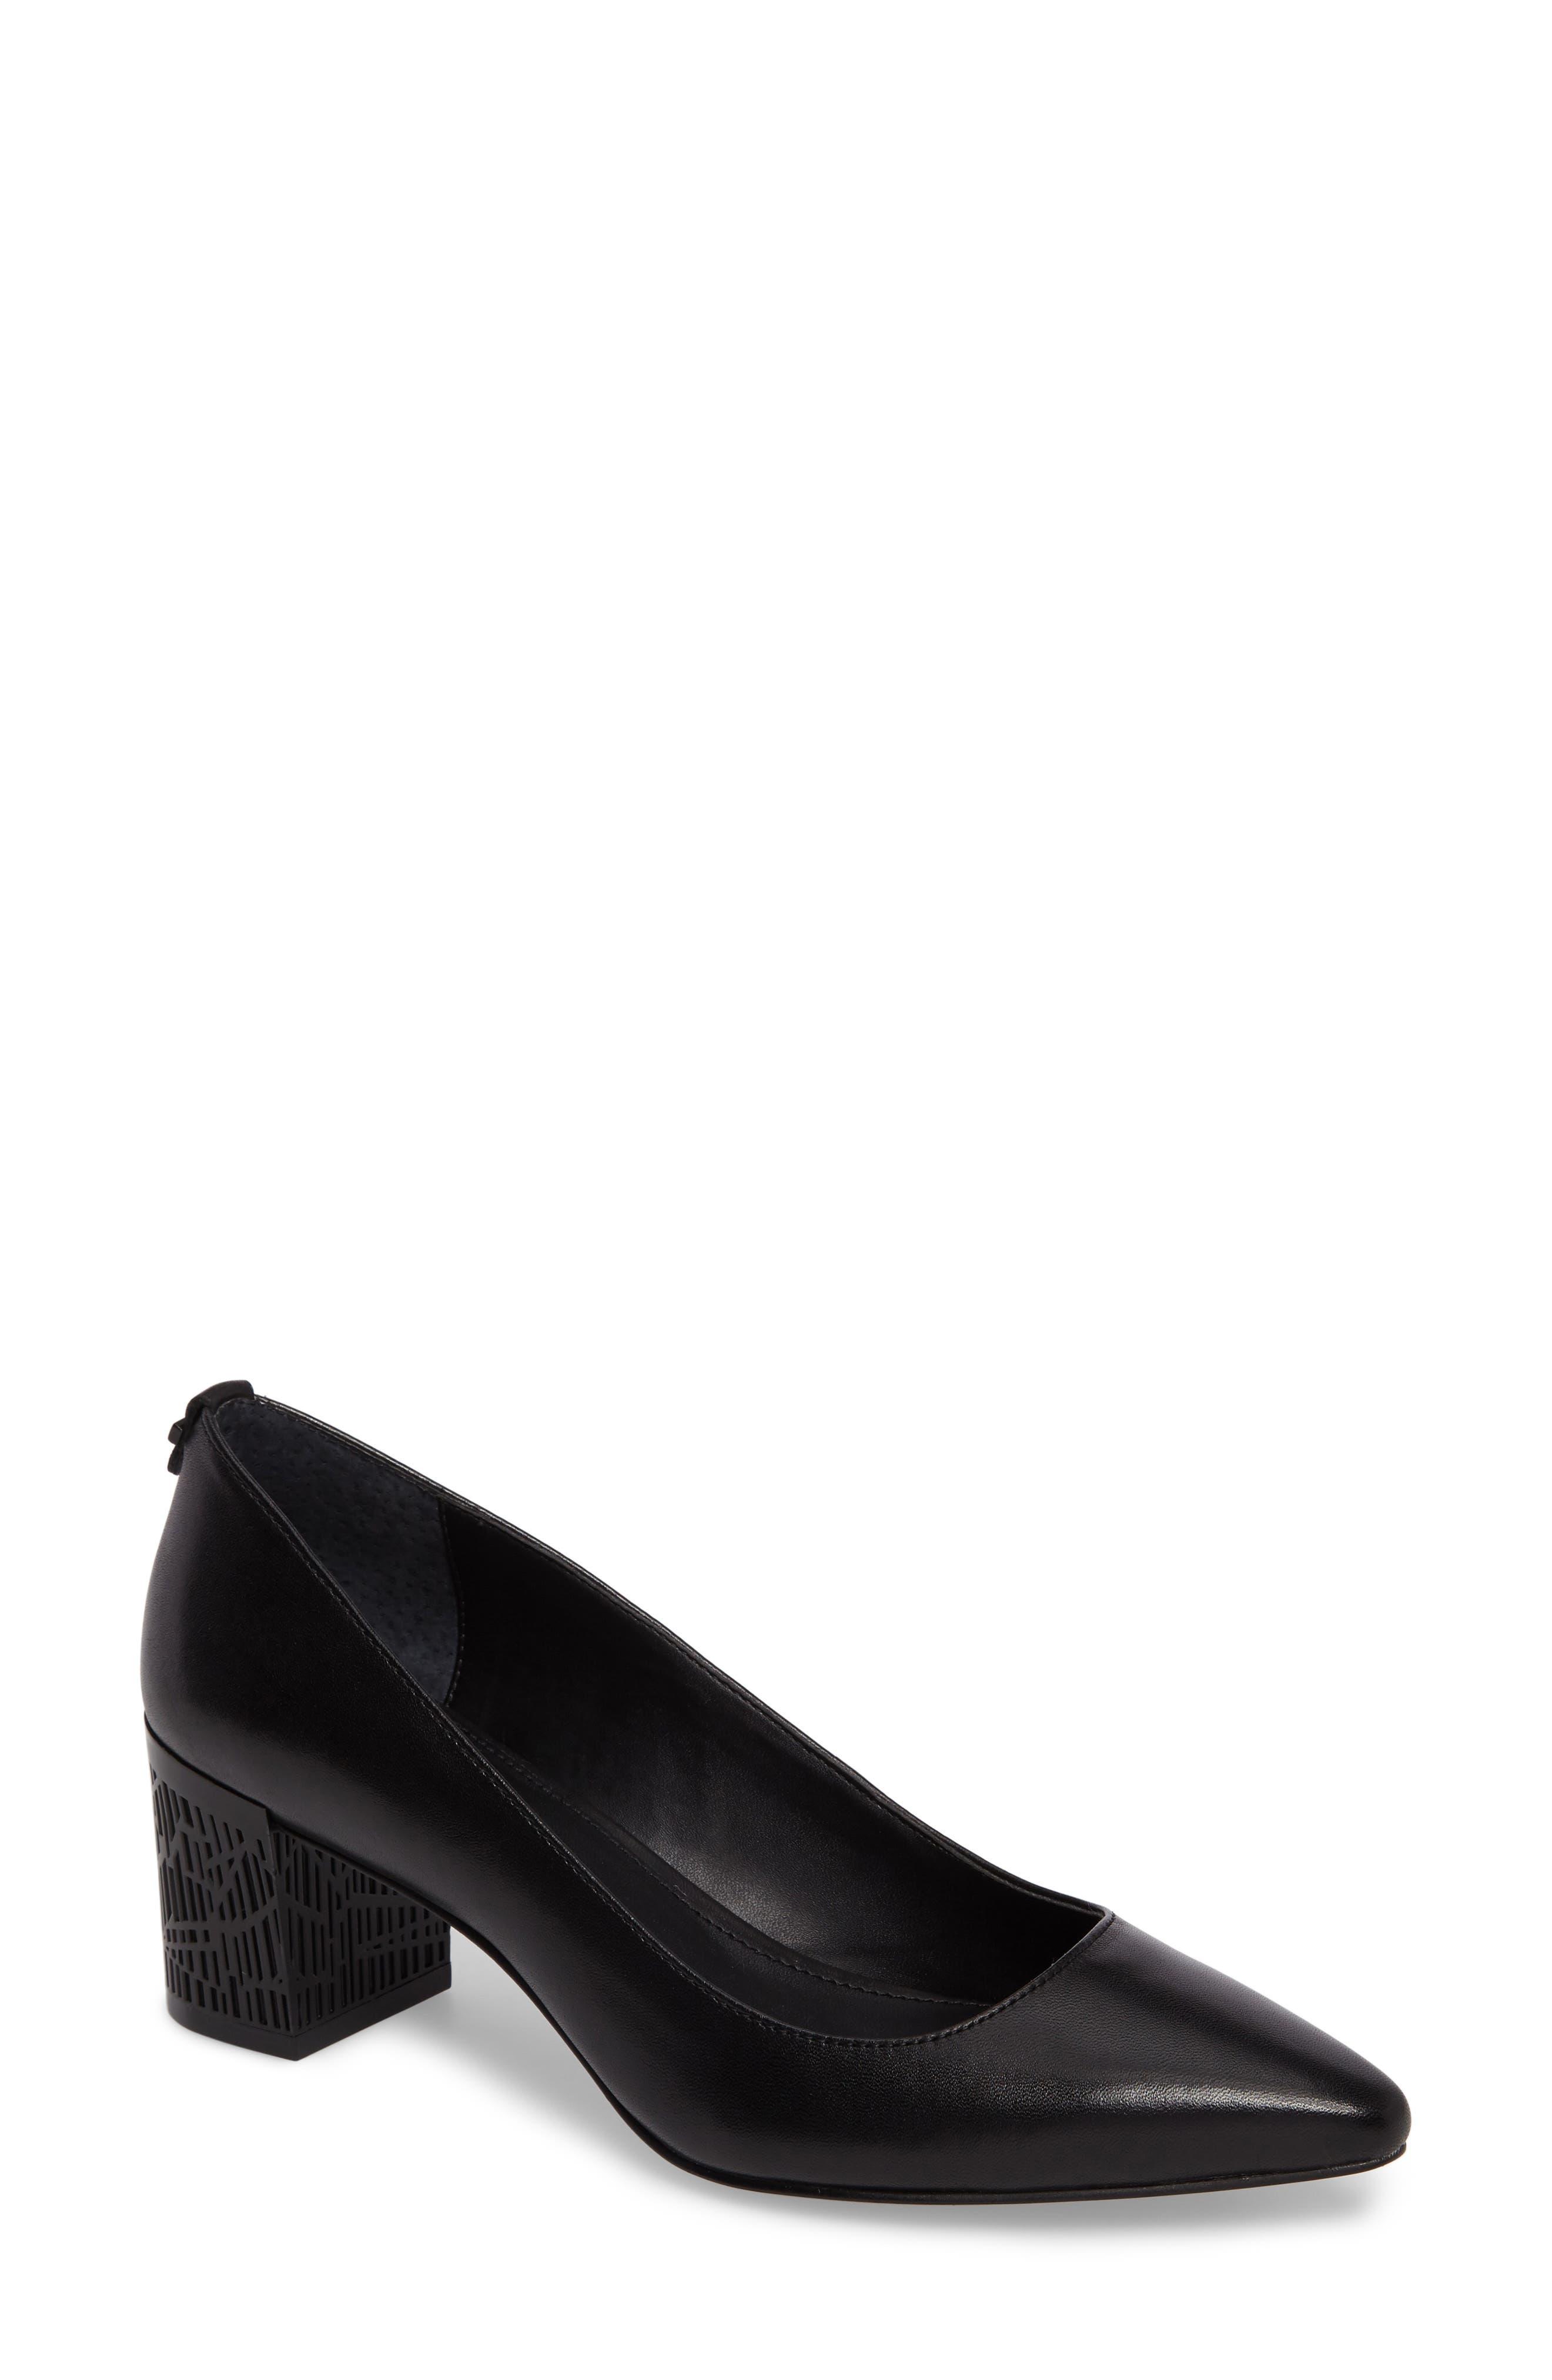 Main Image - Calvin Klein Natalynn 2 Texture Heel Pump (Women)